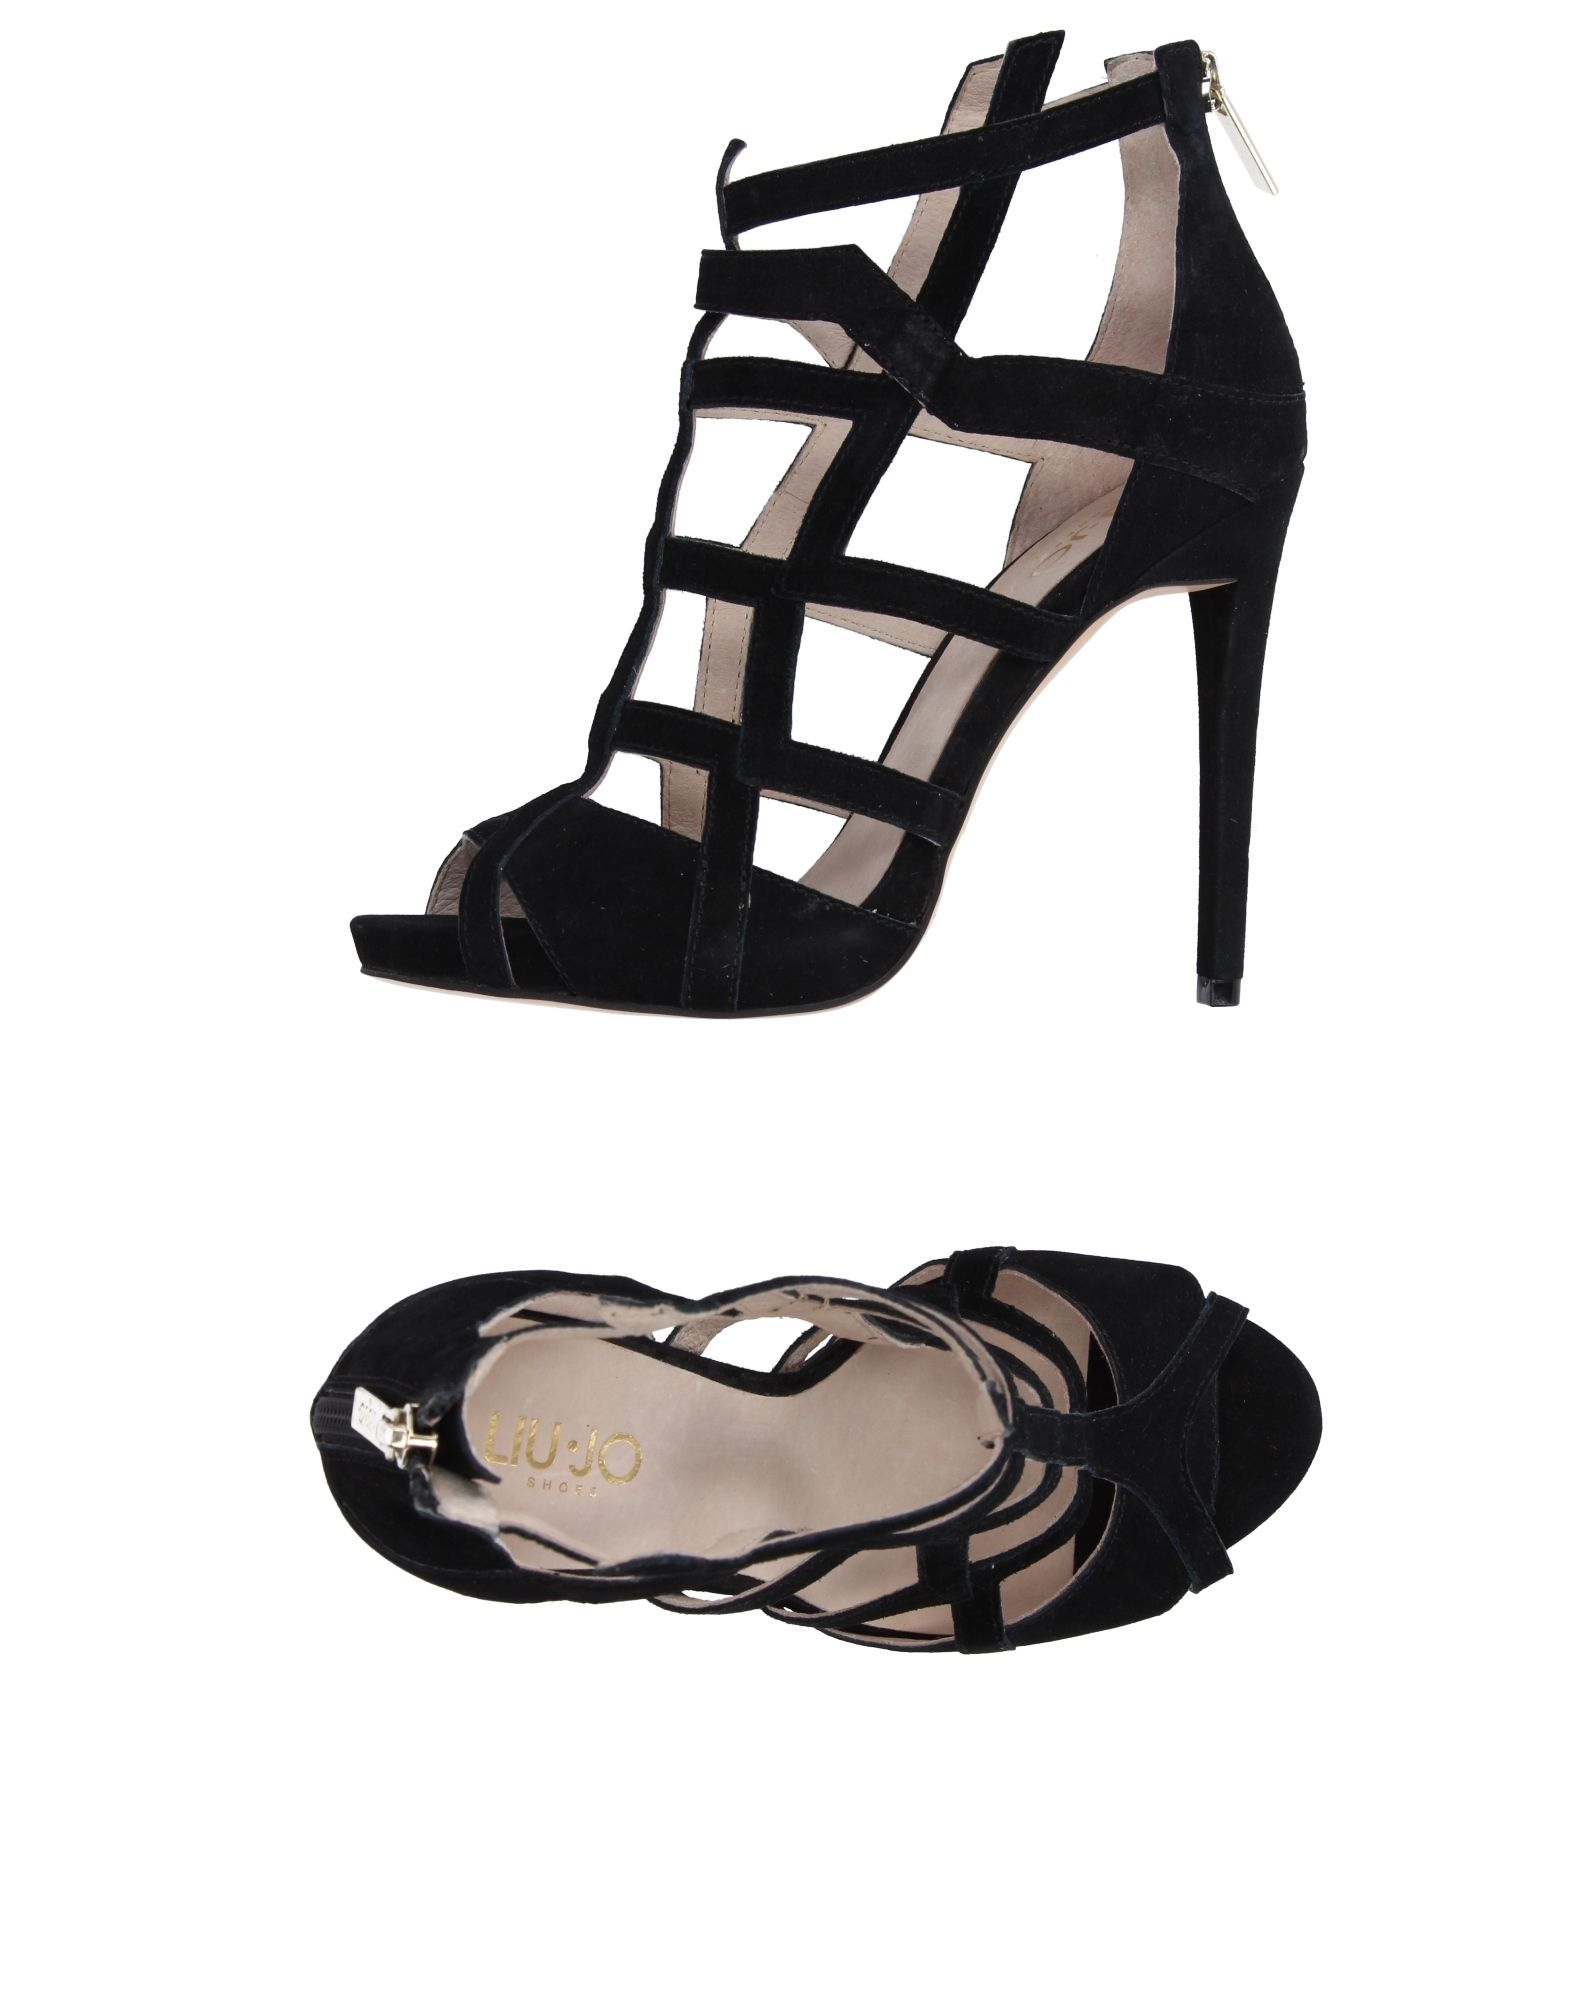 Gut Shoes um billige Schuhe zu tragenLiu •Jo Shoes Gut Sandalen Damen  11217361CE e0e6ed